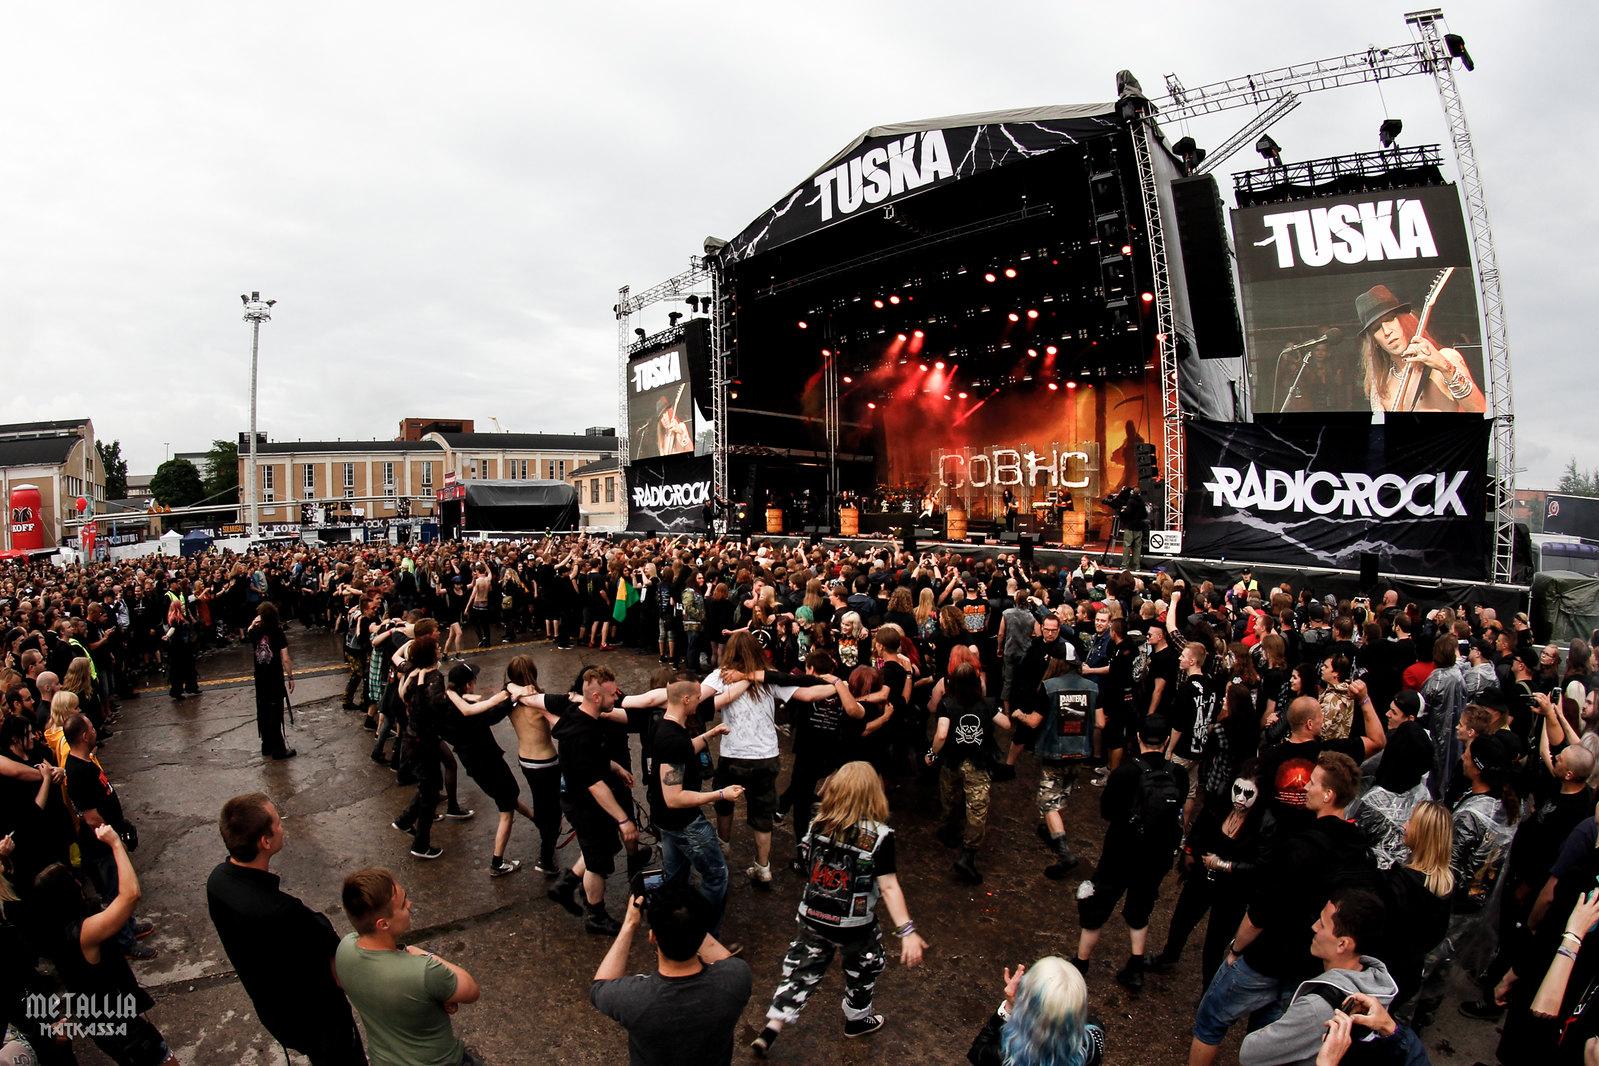 tuska 2016, tuskan päälava, tuska metal festival, tuska festival, hellsinki for headbangers, finnish metal festivals, metal festival, children of bodom, mosh pit